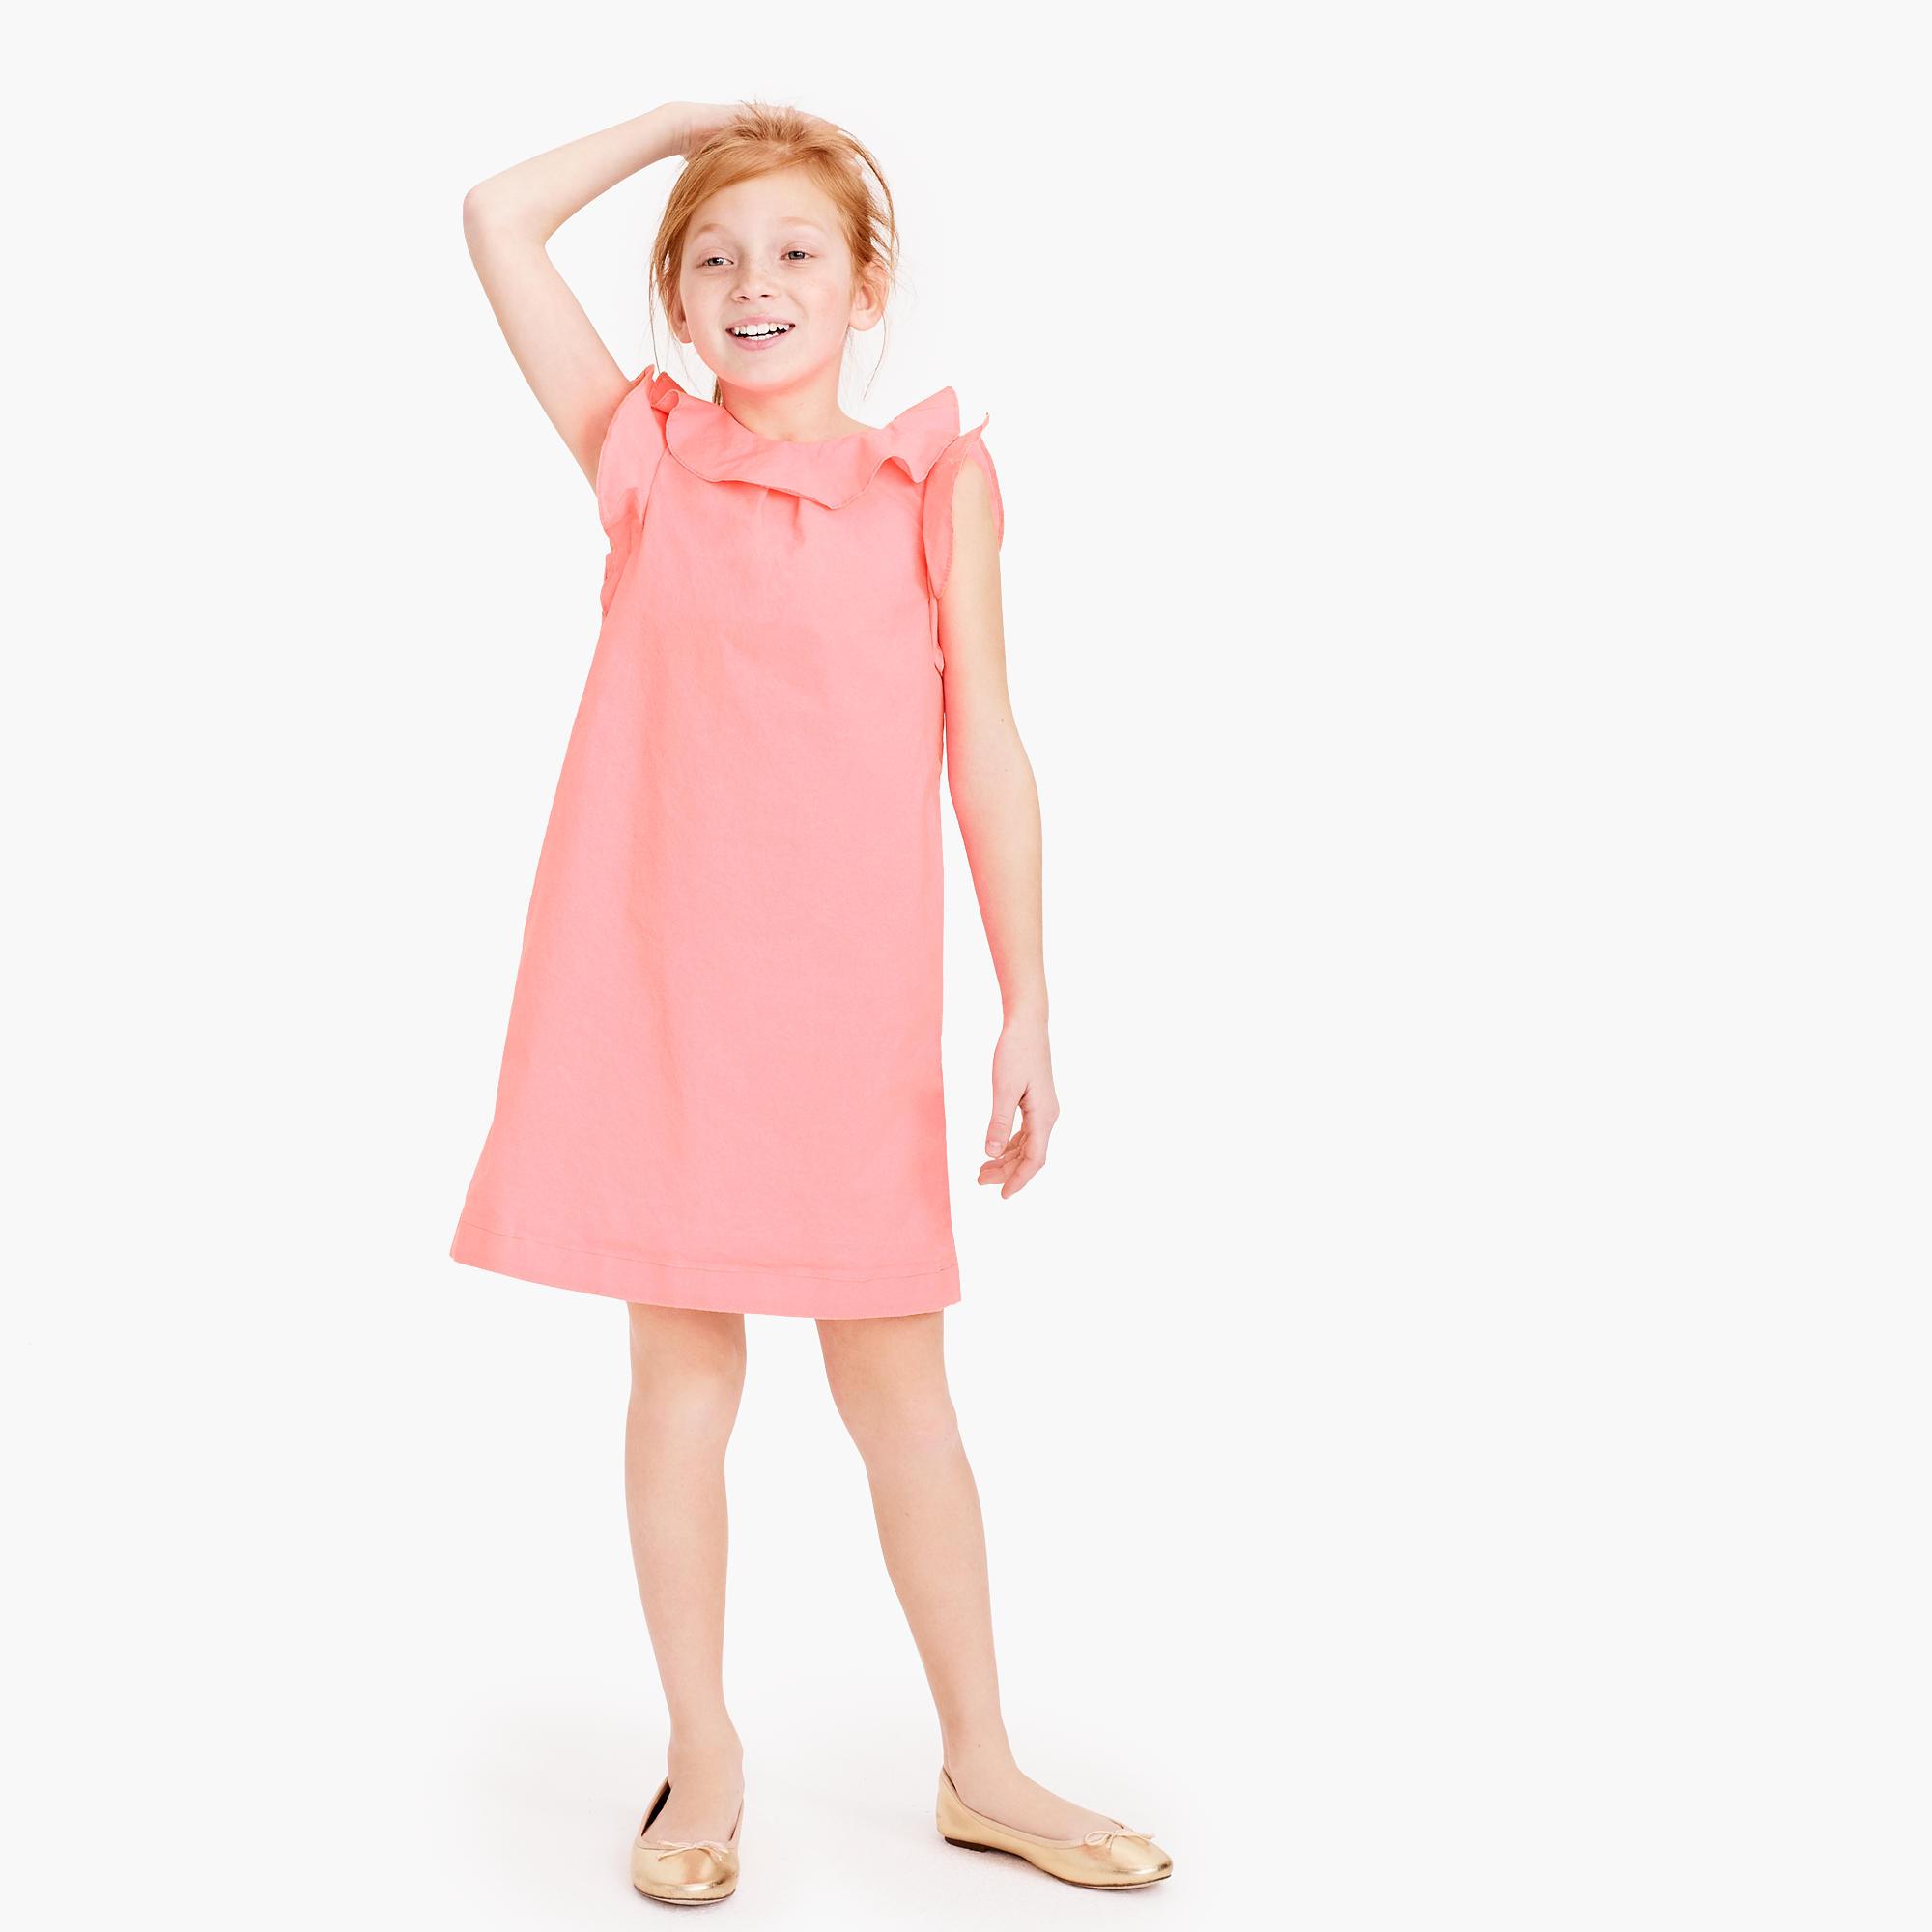 Christmas dress attire for age 57 - Girls Ruffle Poplin Dress